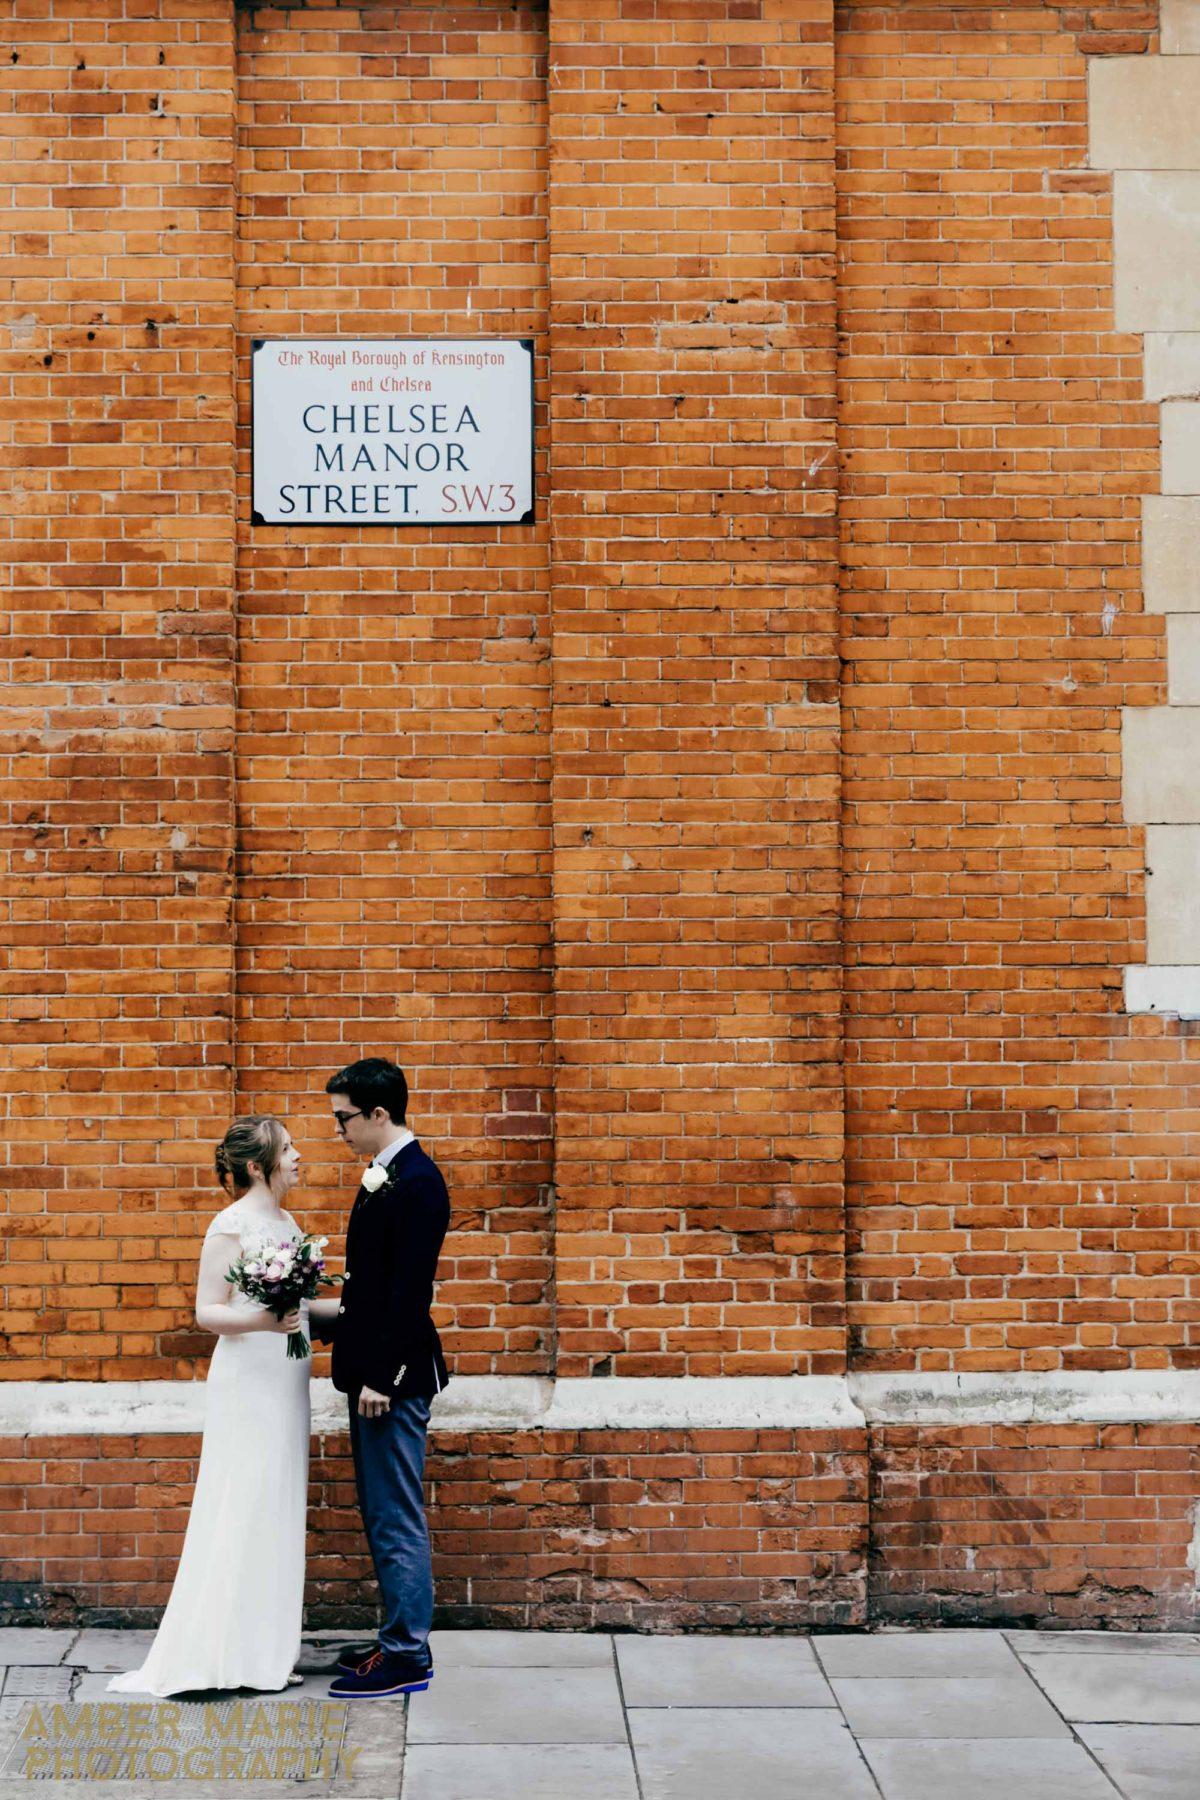 Chelsea & Kensington Wedding Photography